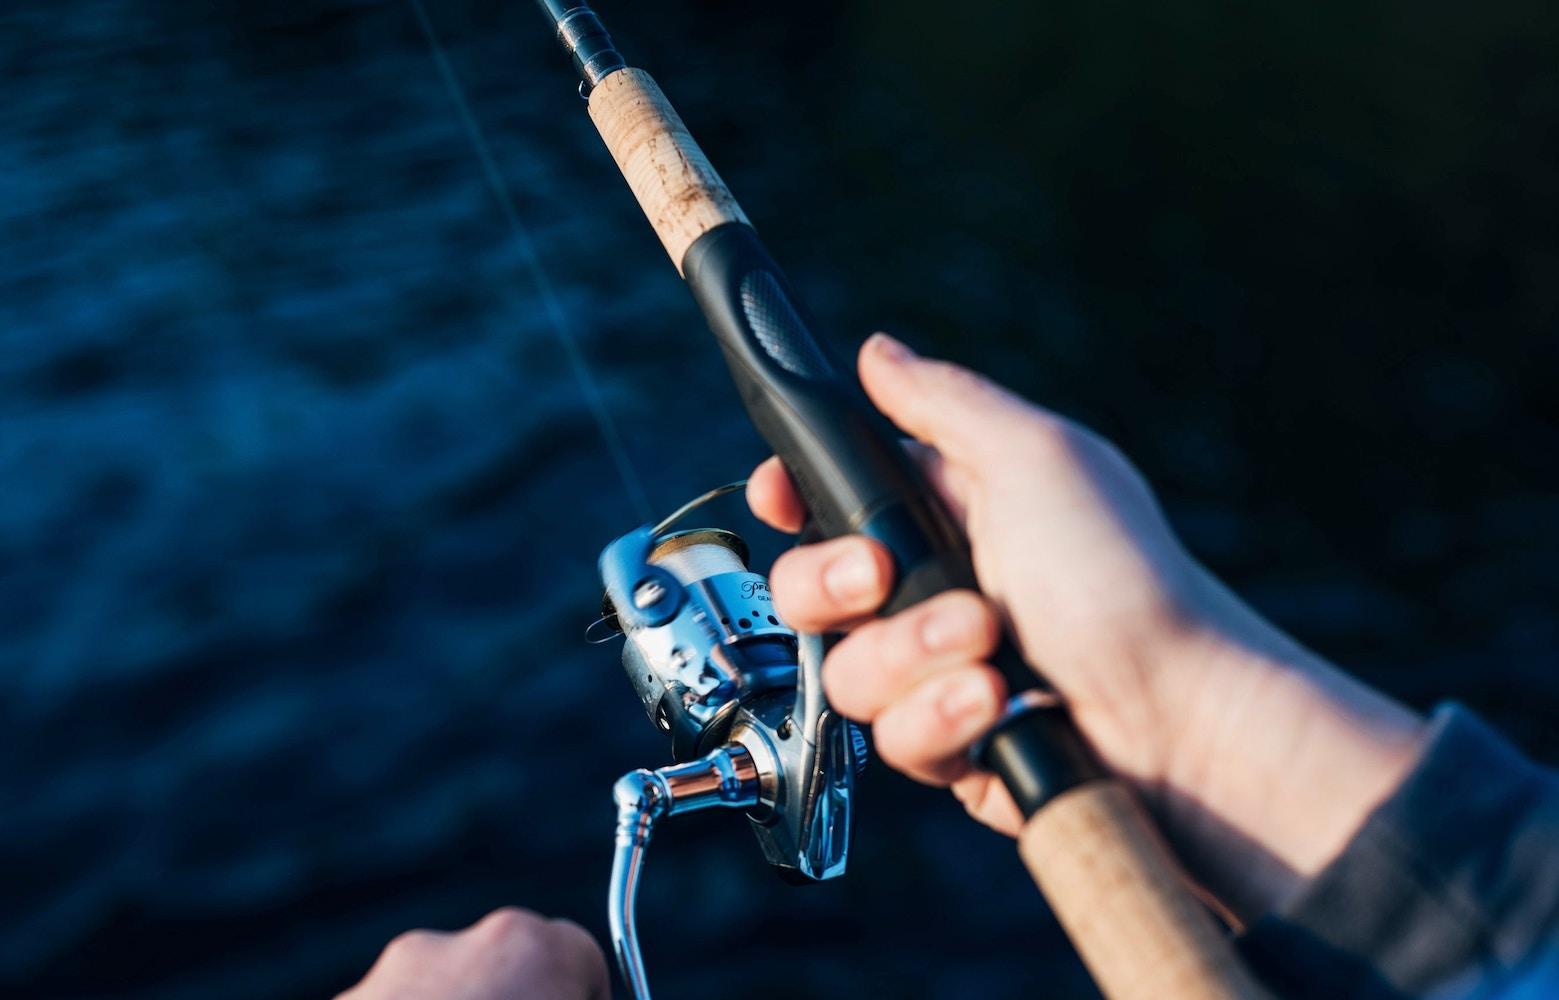 Introducing Fishing Innovator Talbot Kennedy & HandiAccessories